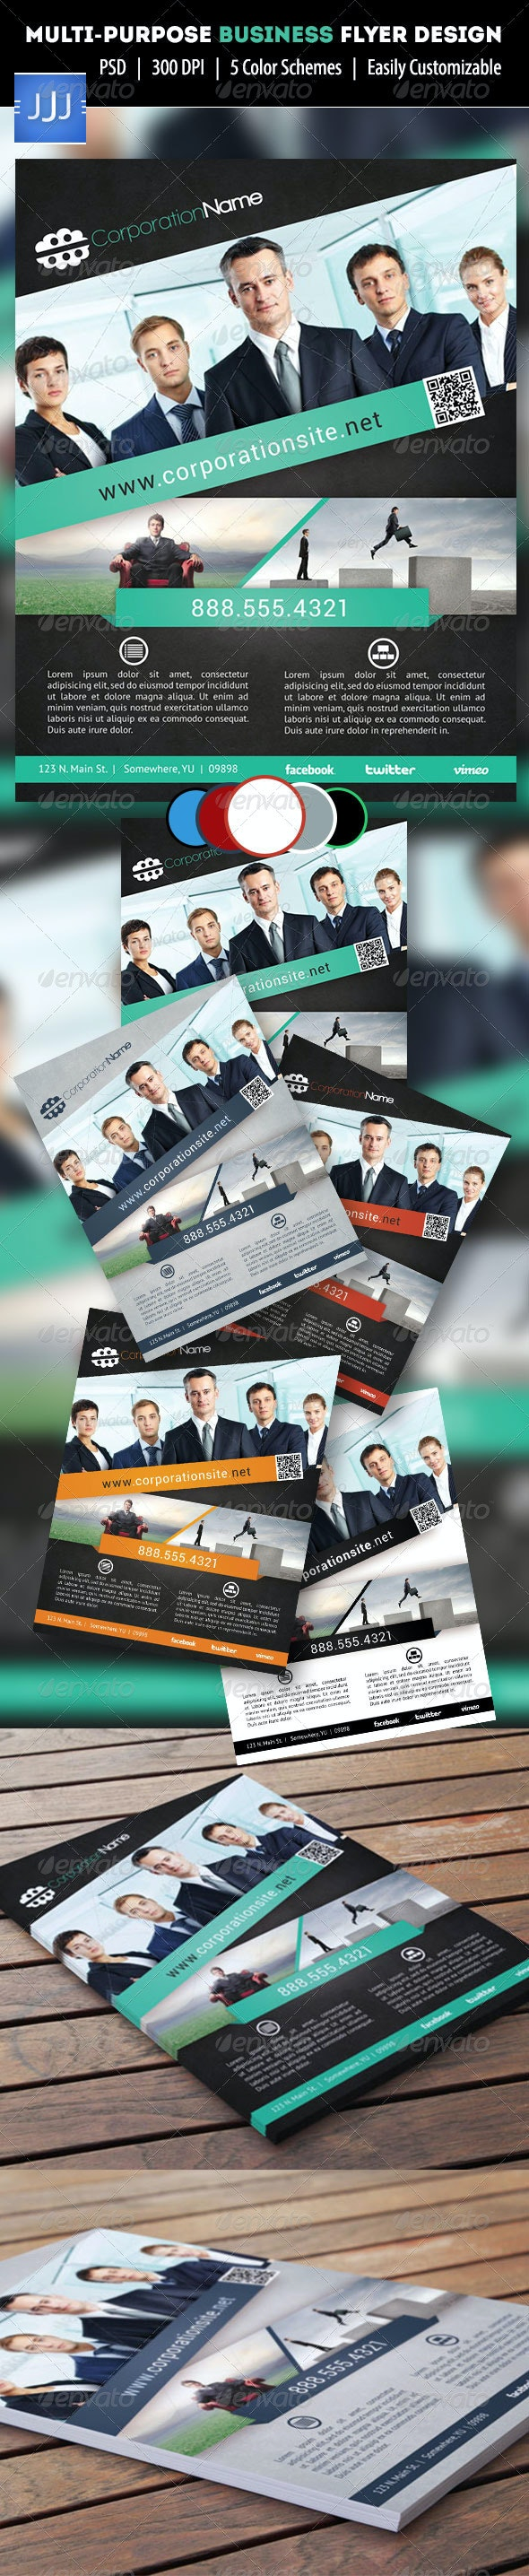 Multipurpose Business Flyer 13 - Corporate Flyers